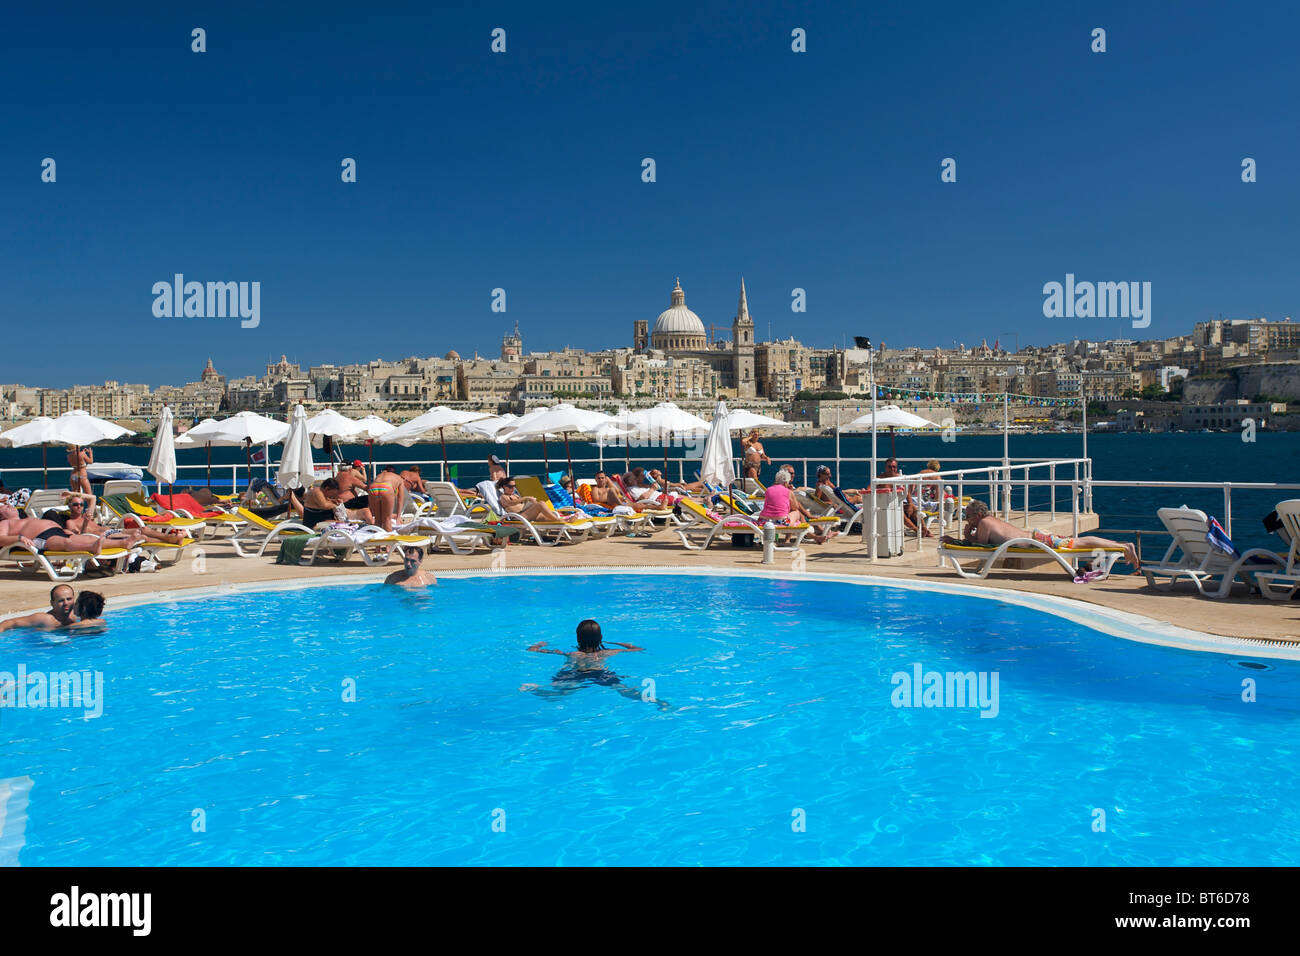 Hotel swimming pool in Sliema, Valletta, Malta - Stock Image